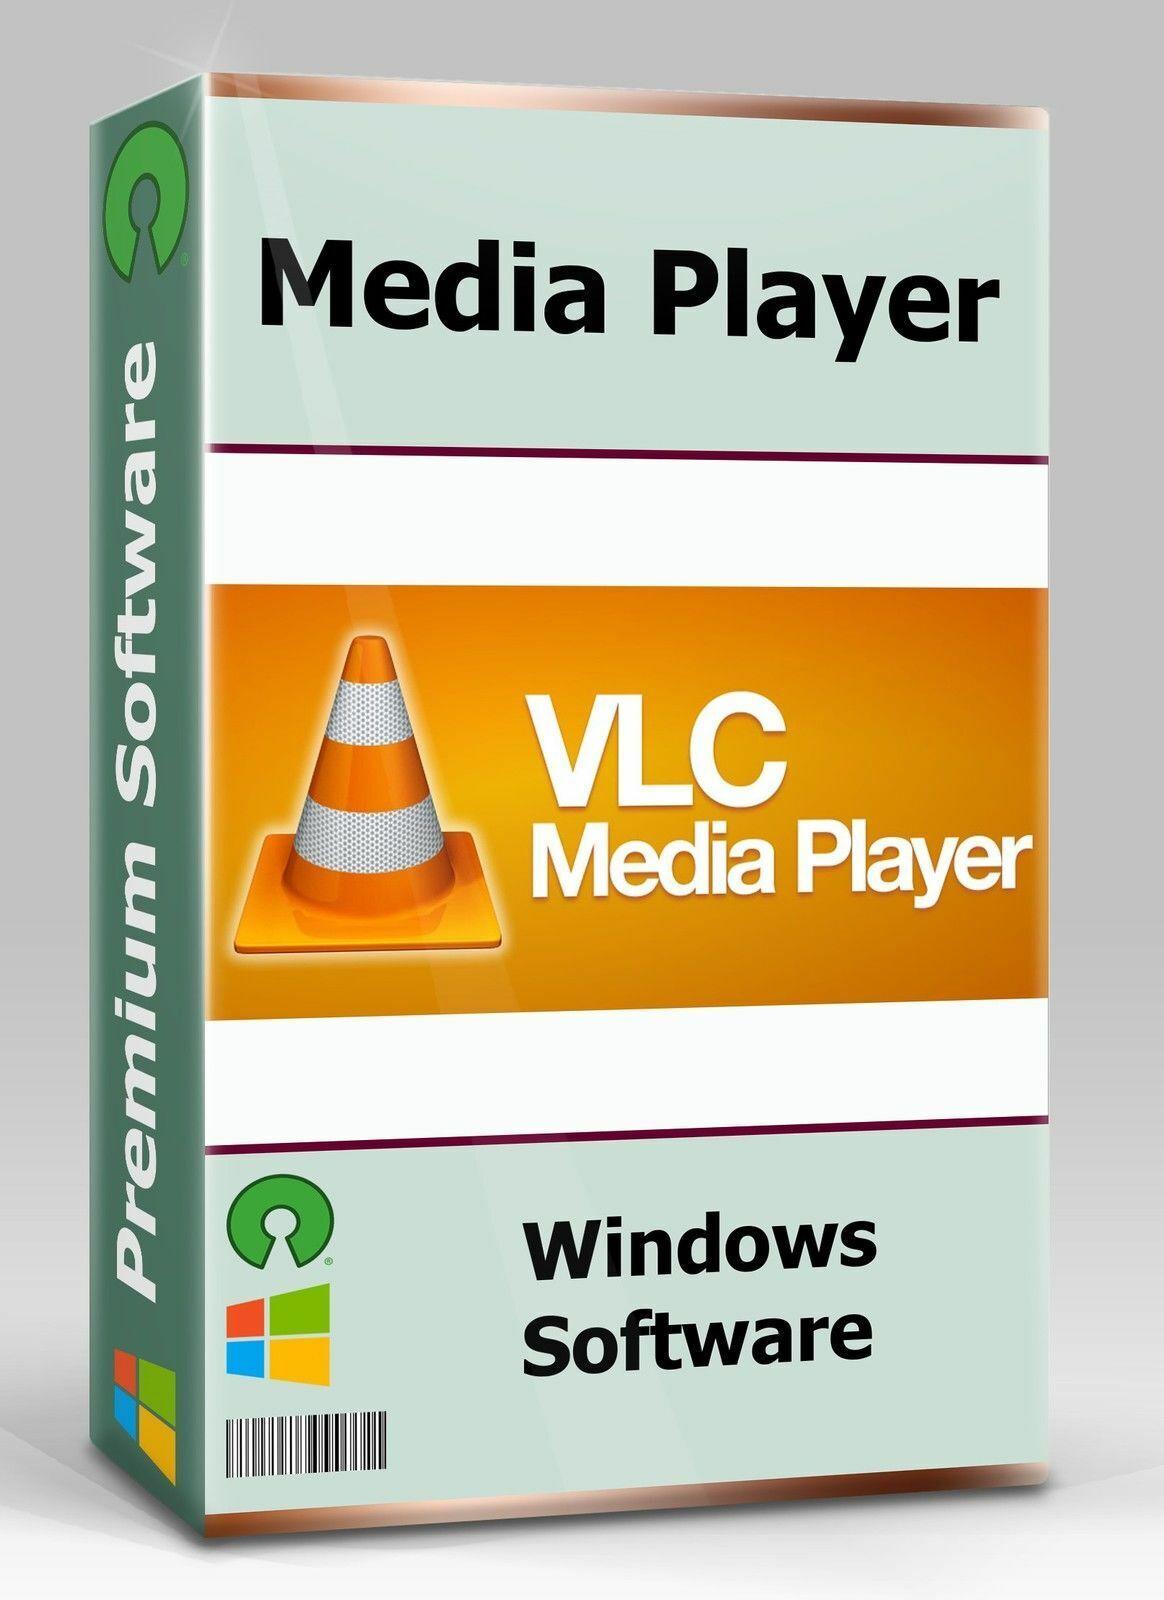 AVI | MP4 | DIVX | WMV | MPEG | DVD | CD | VCD | MKV | VLC Media Player Software